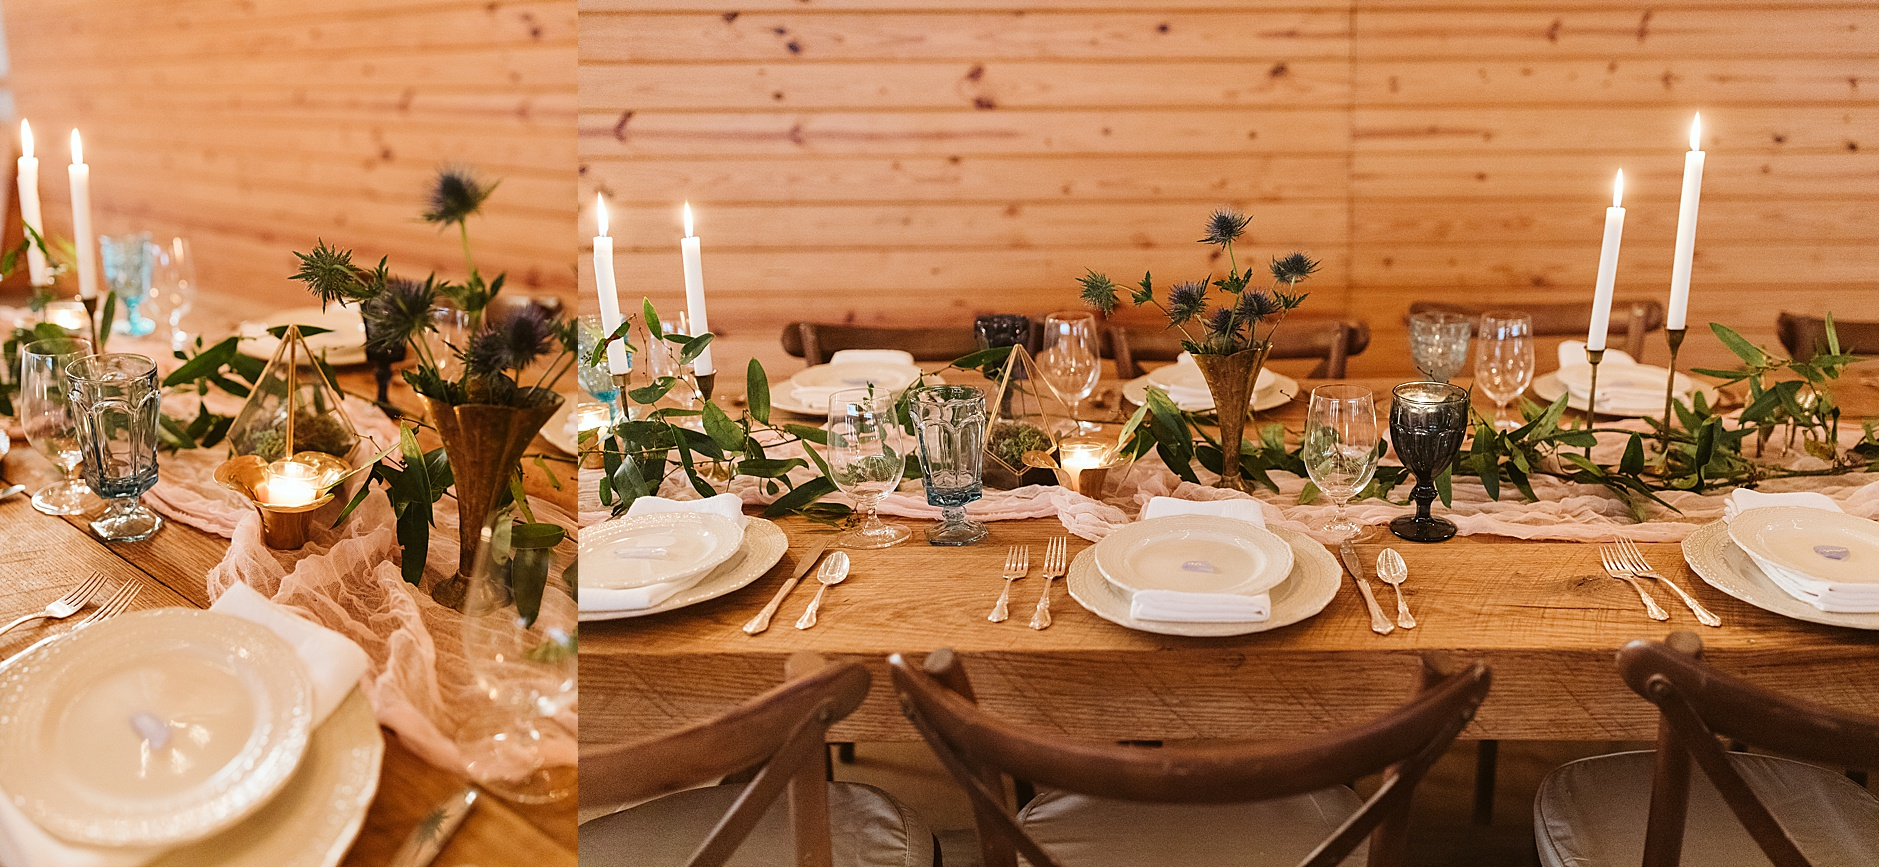 kansas city wedding venue inspiration-0268.jpg